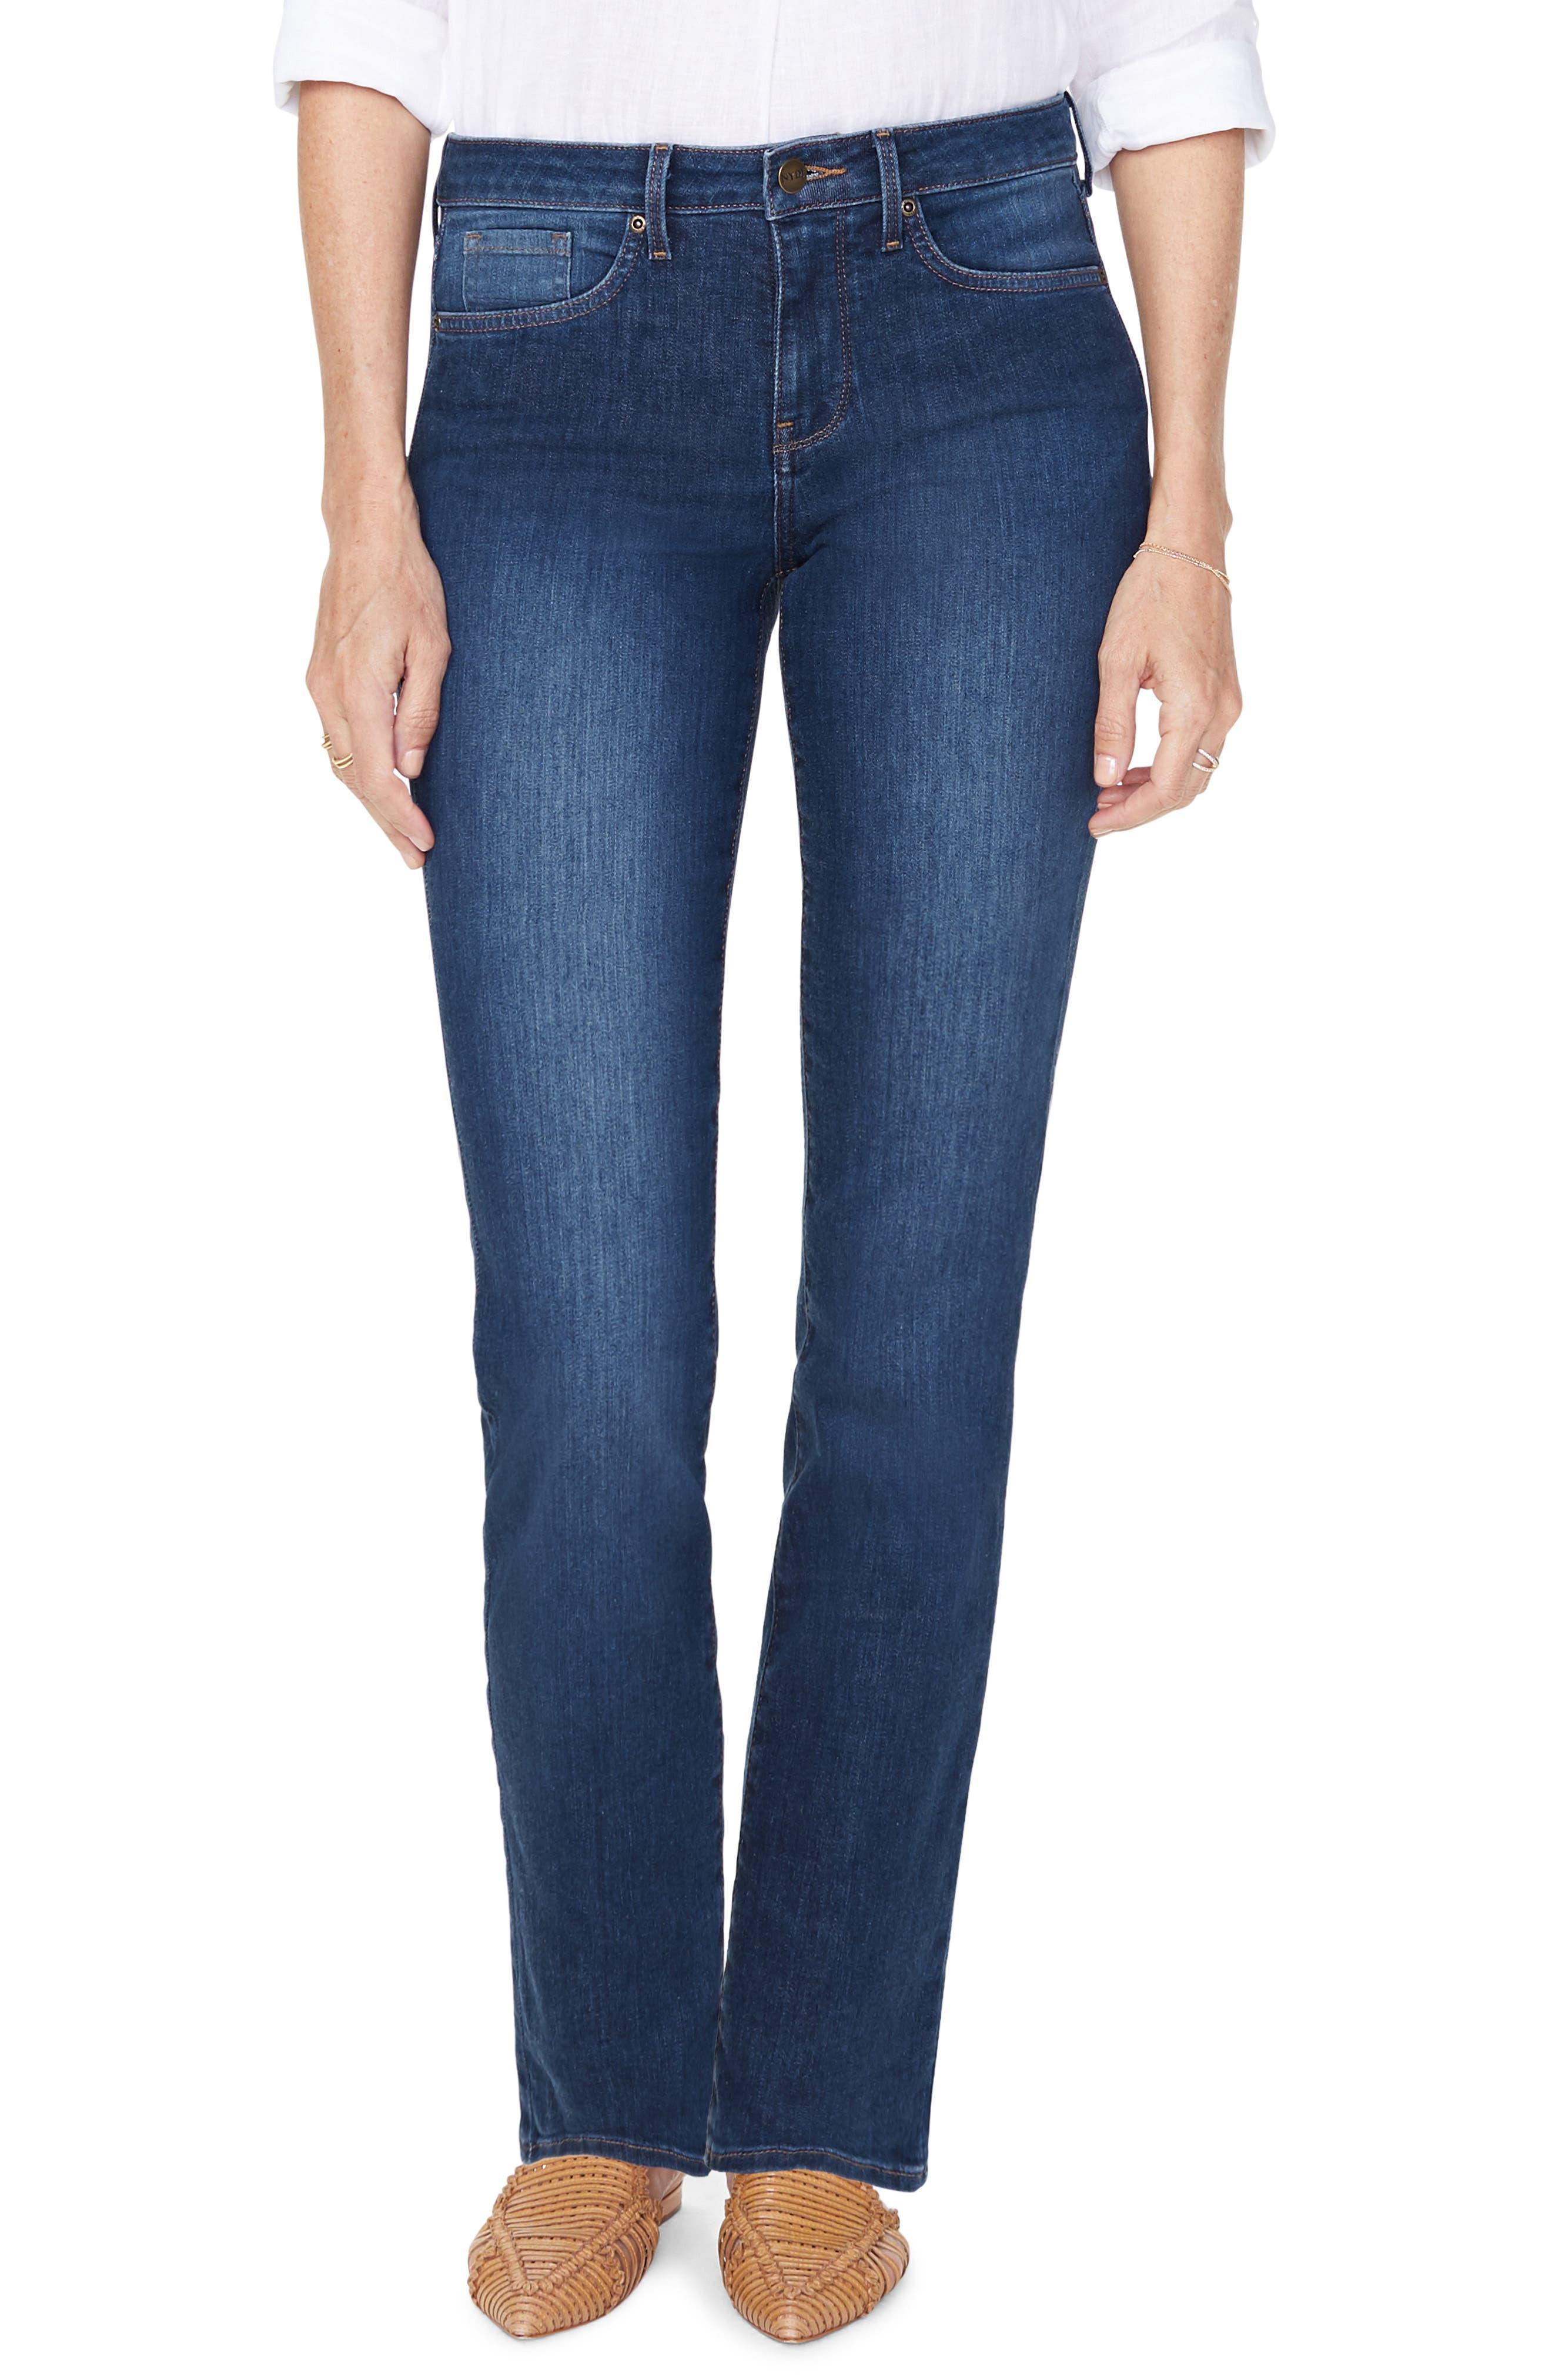 Women's NYDJ Sheri Slim Cut Jeans